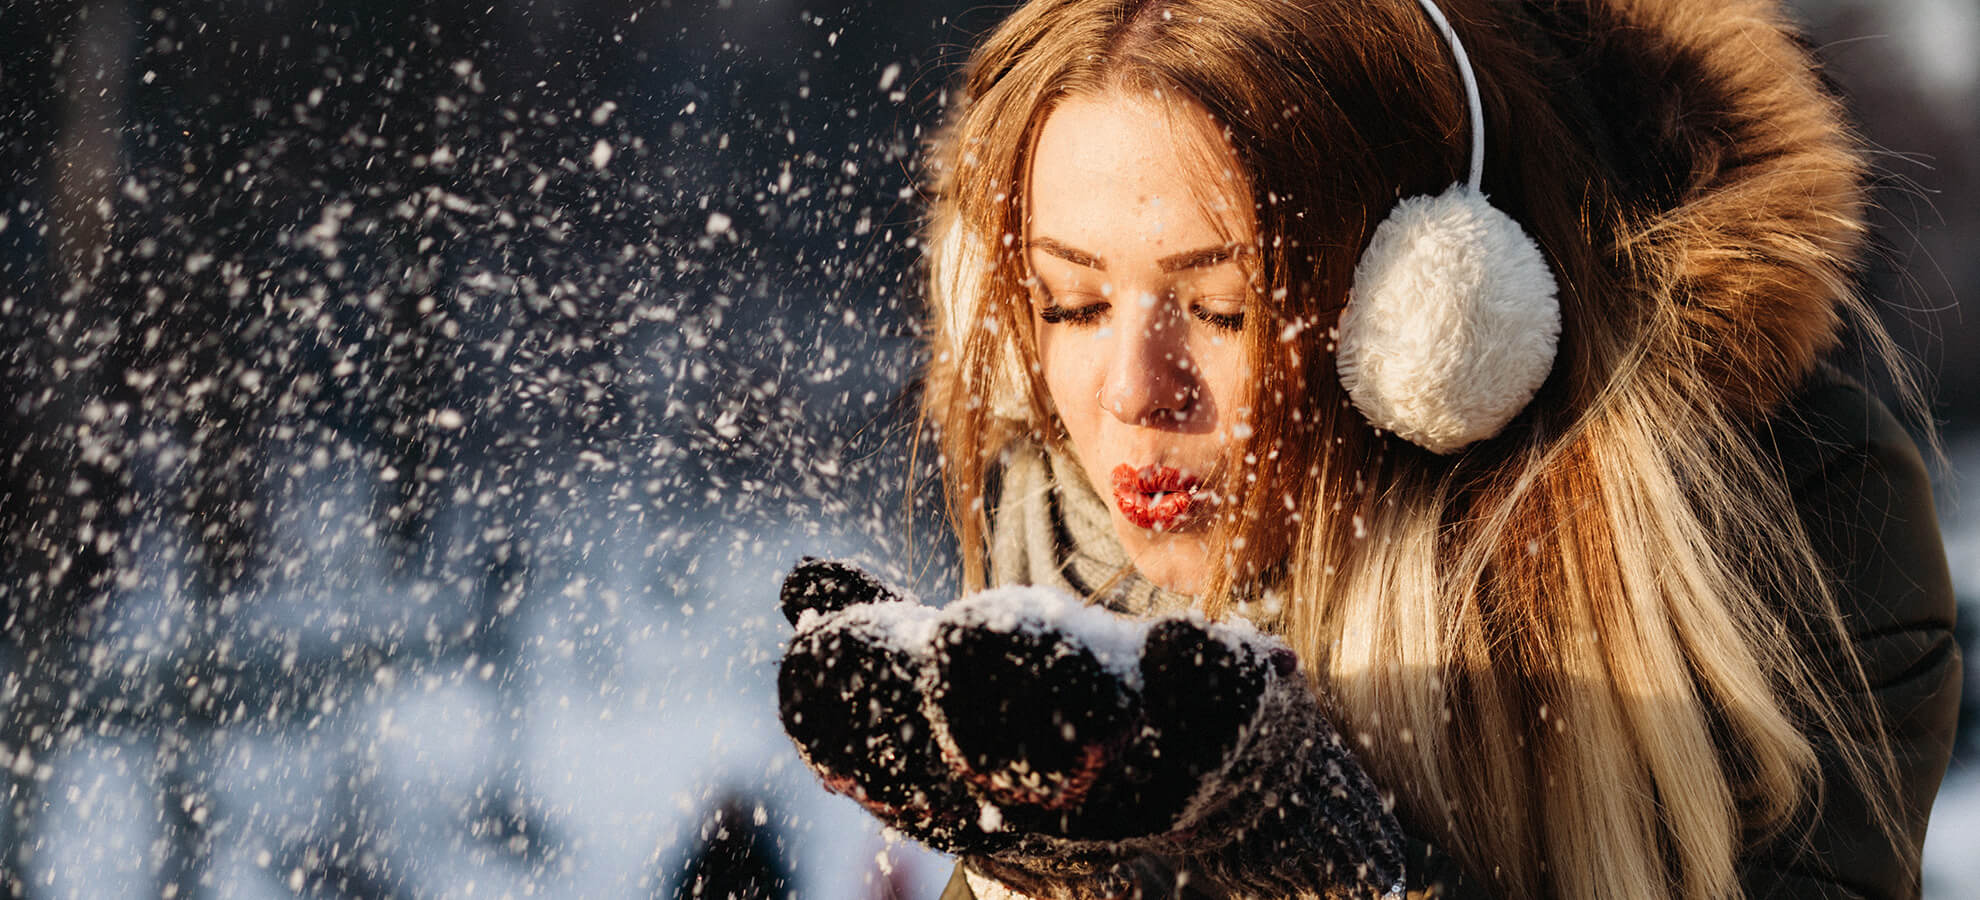 Stylissimo_Mona-Schulze_Winter Spezial